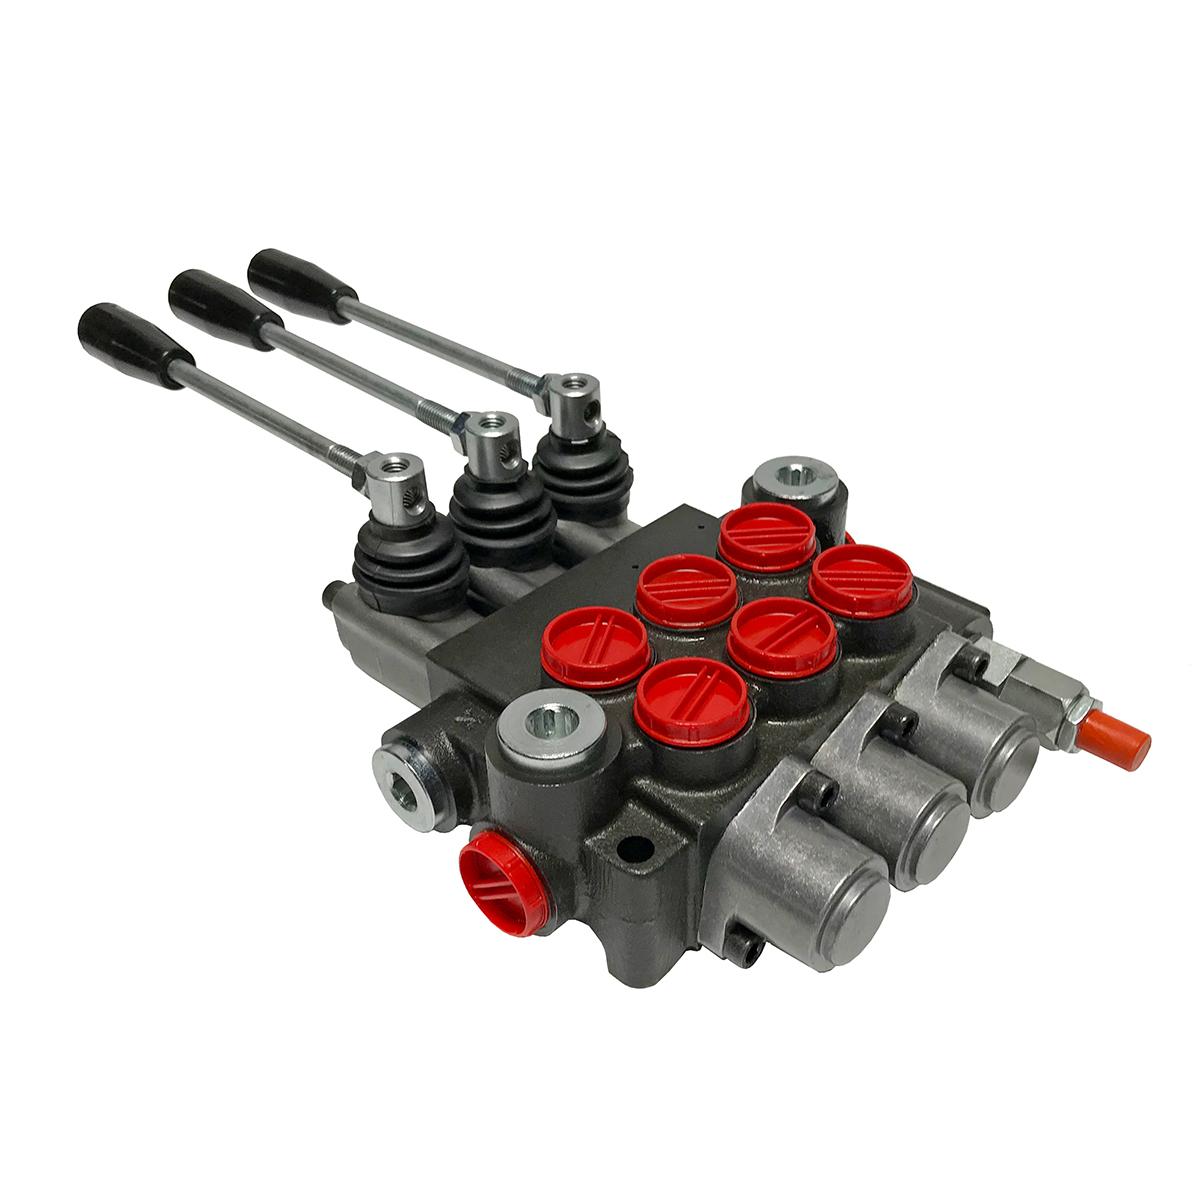 3 spool x 13 GPM hydraulic control valve, monoblock cast iron valve | Magister Hydraulics